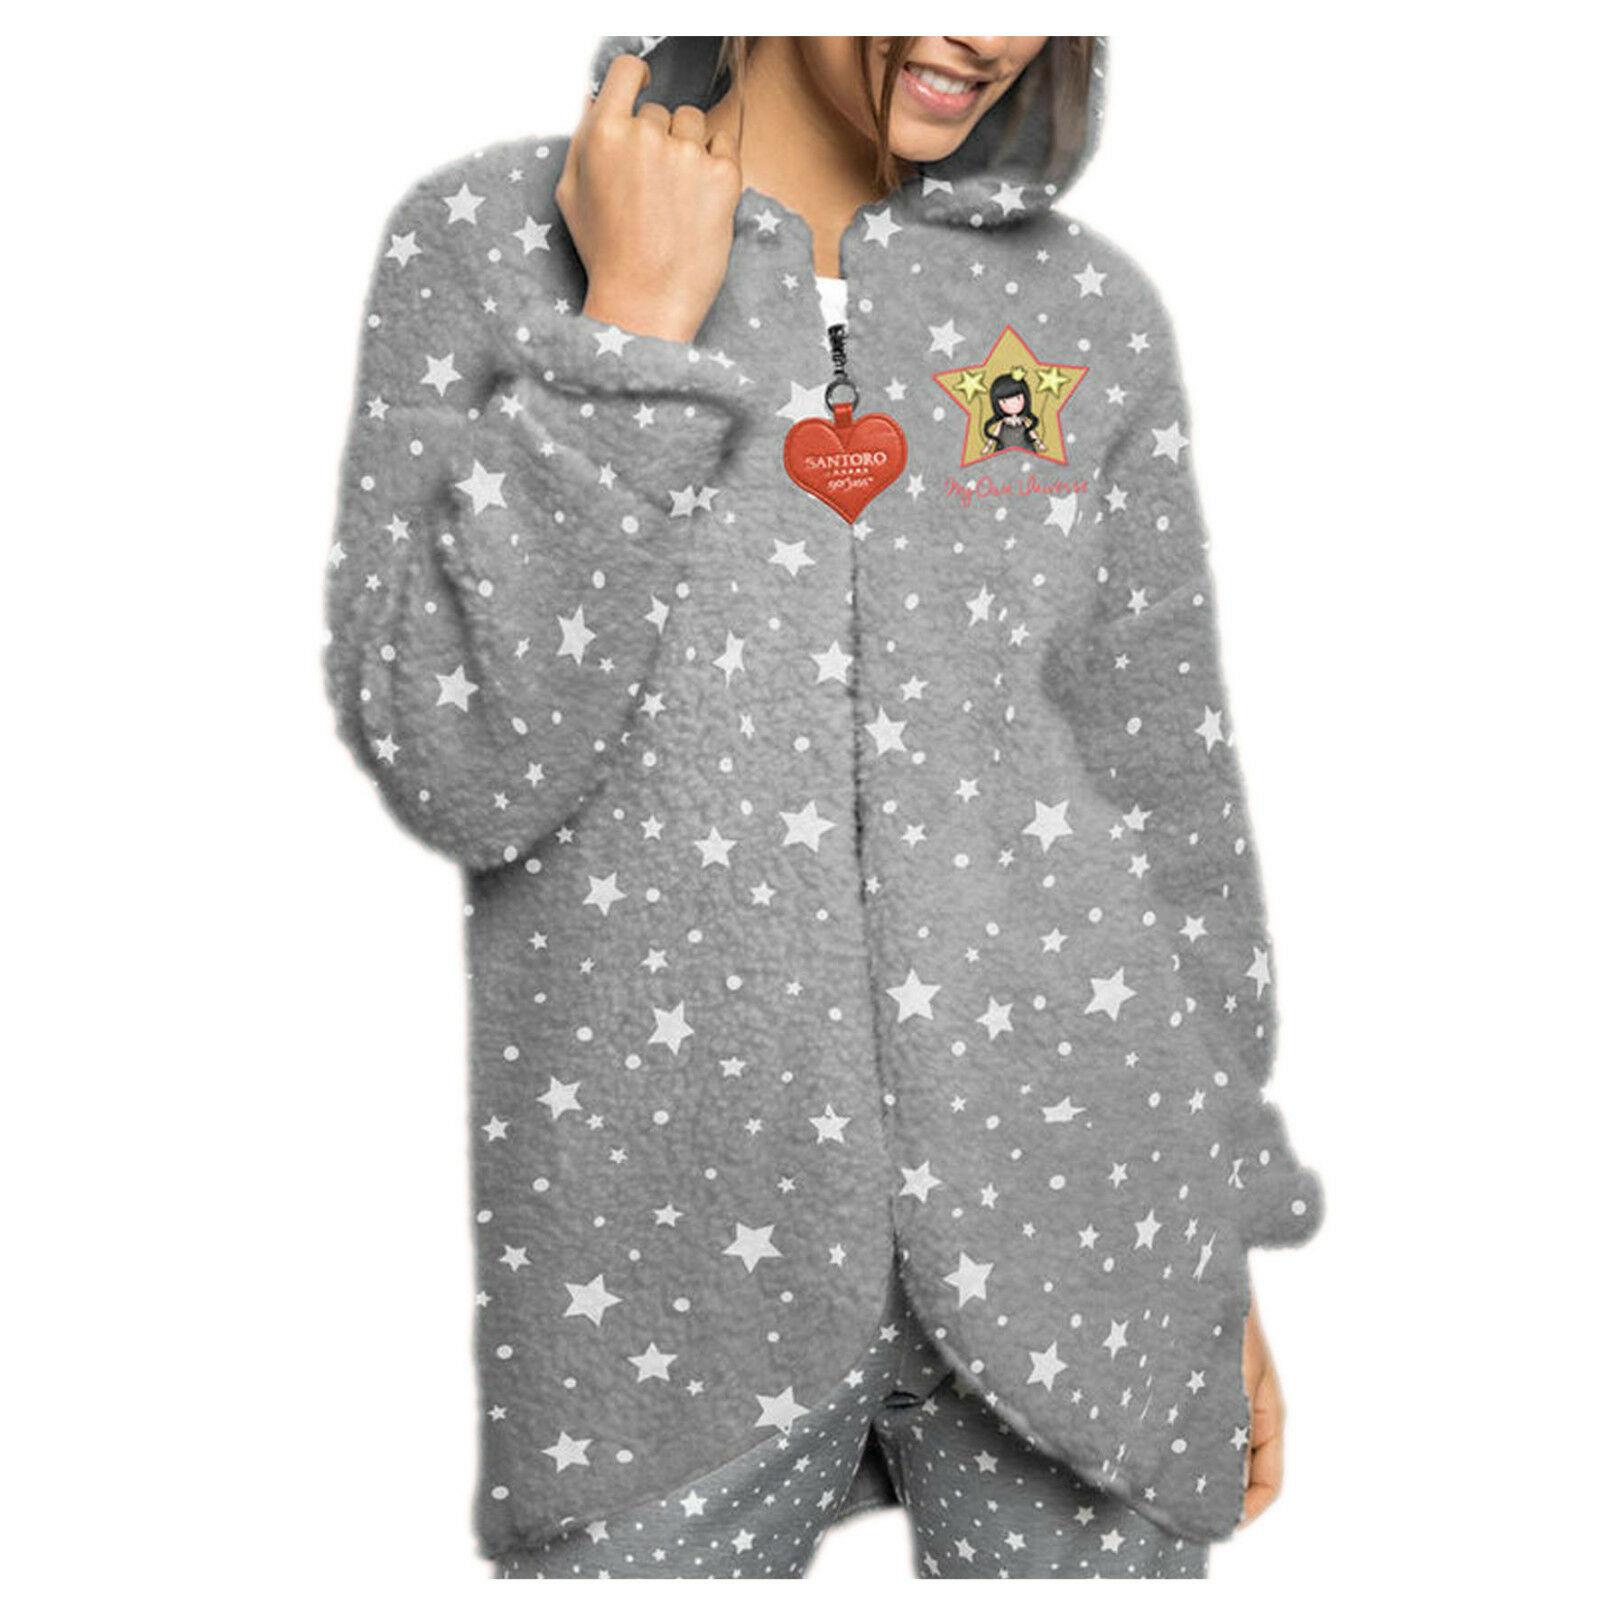 SANTORO GORJUSS vestaglia 3/4,giacca da camera in morbido e caldo Corel donna/ba